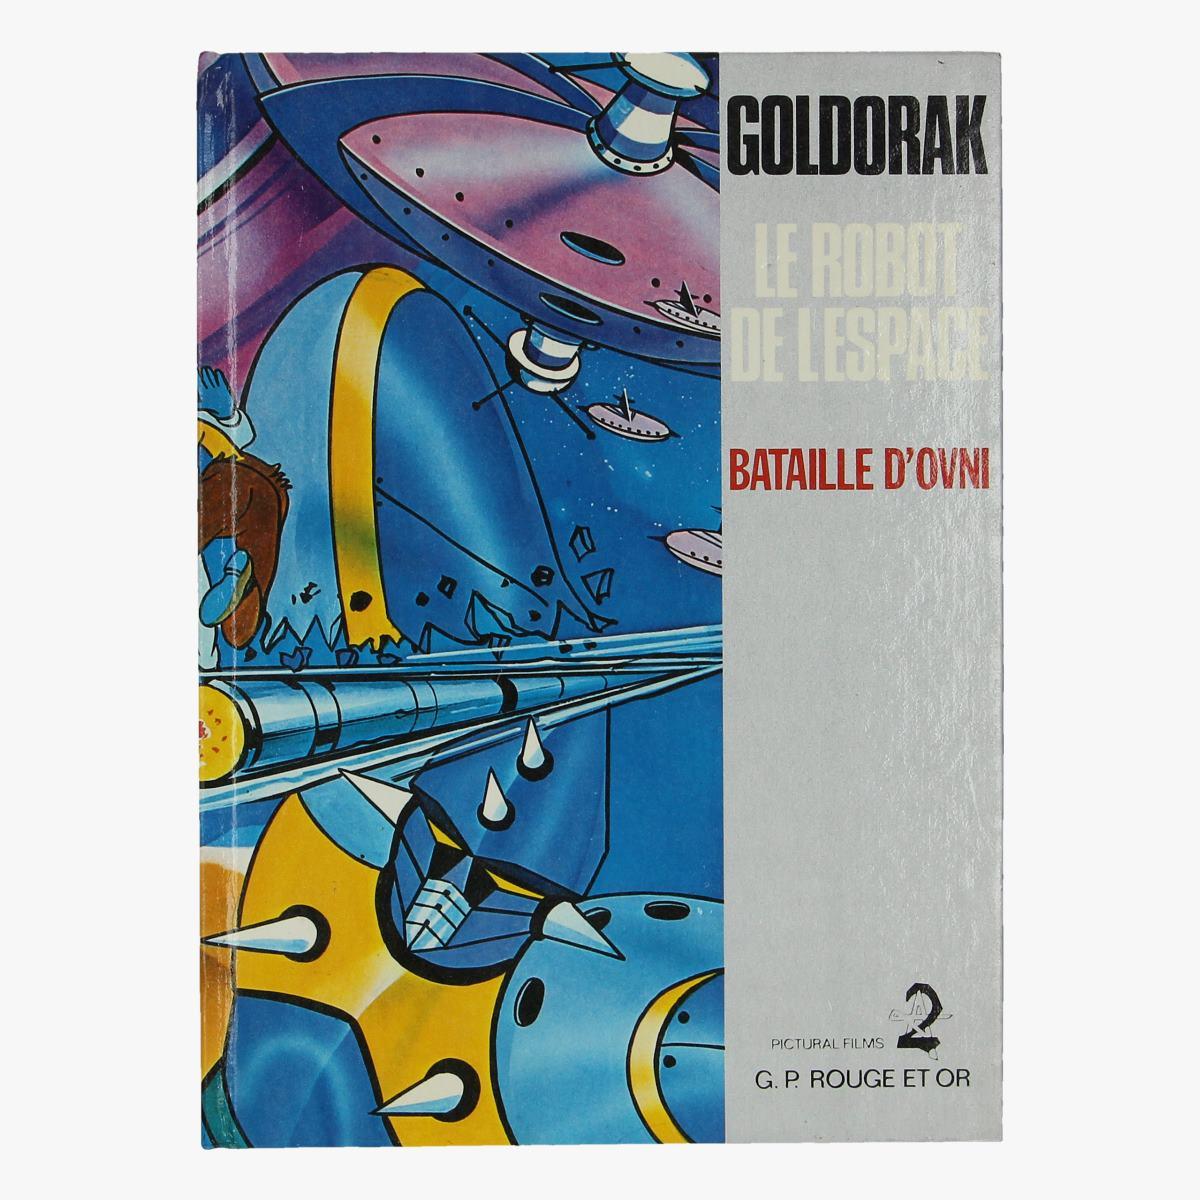 Afbeeldingen van golddrak le robot de l'espace 1978